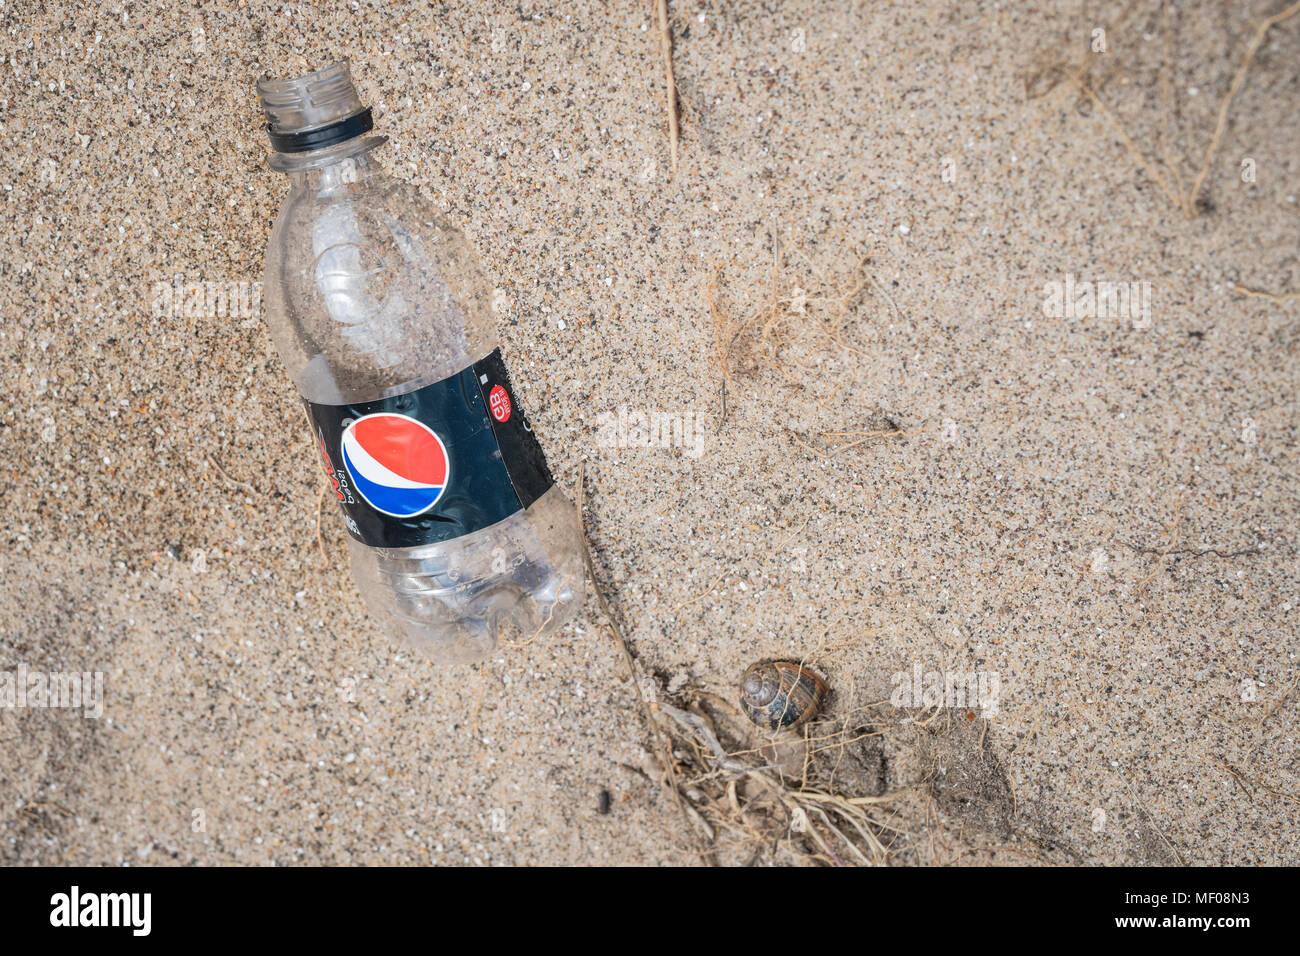 Plastic Pepsi bottle discarded on beach - Stock Image